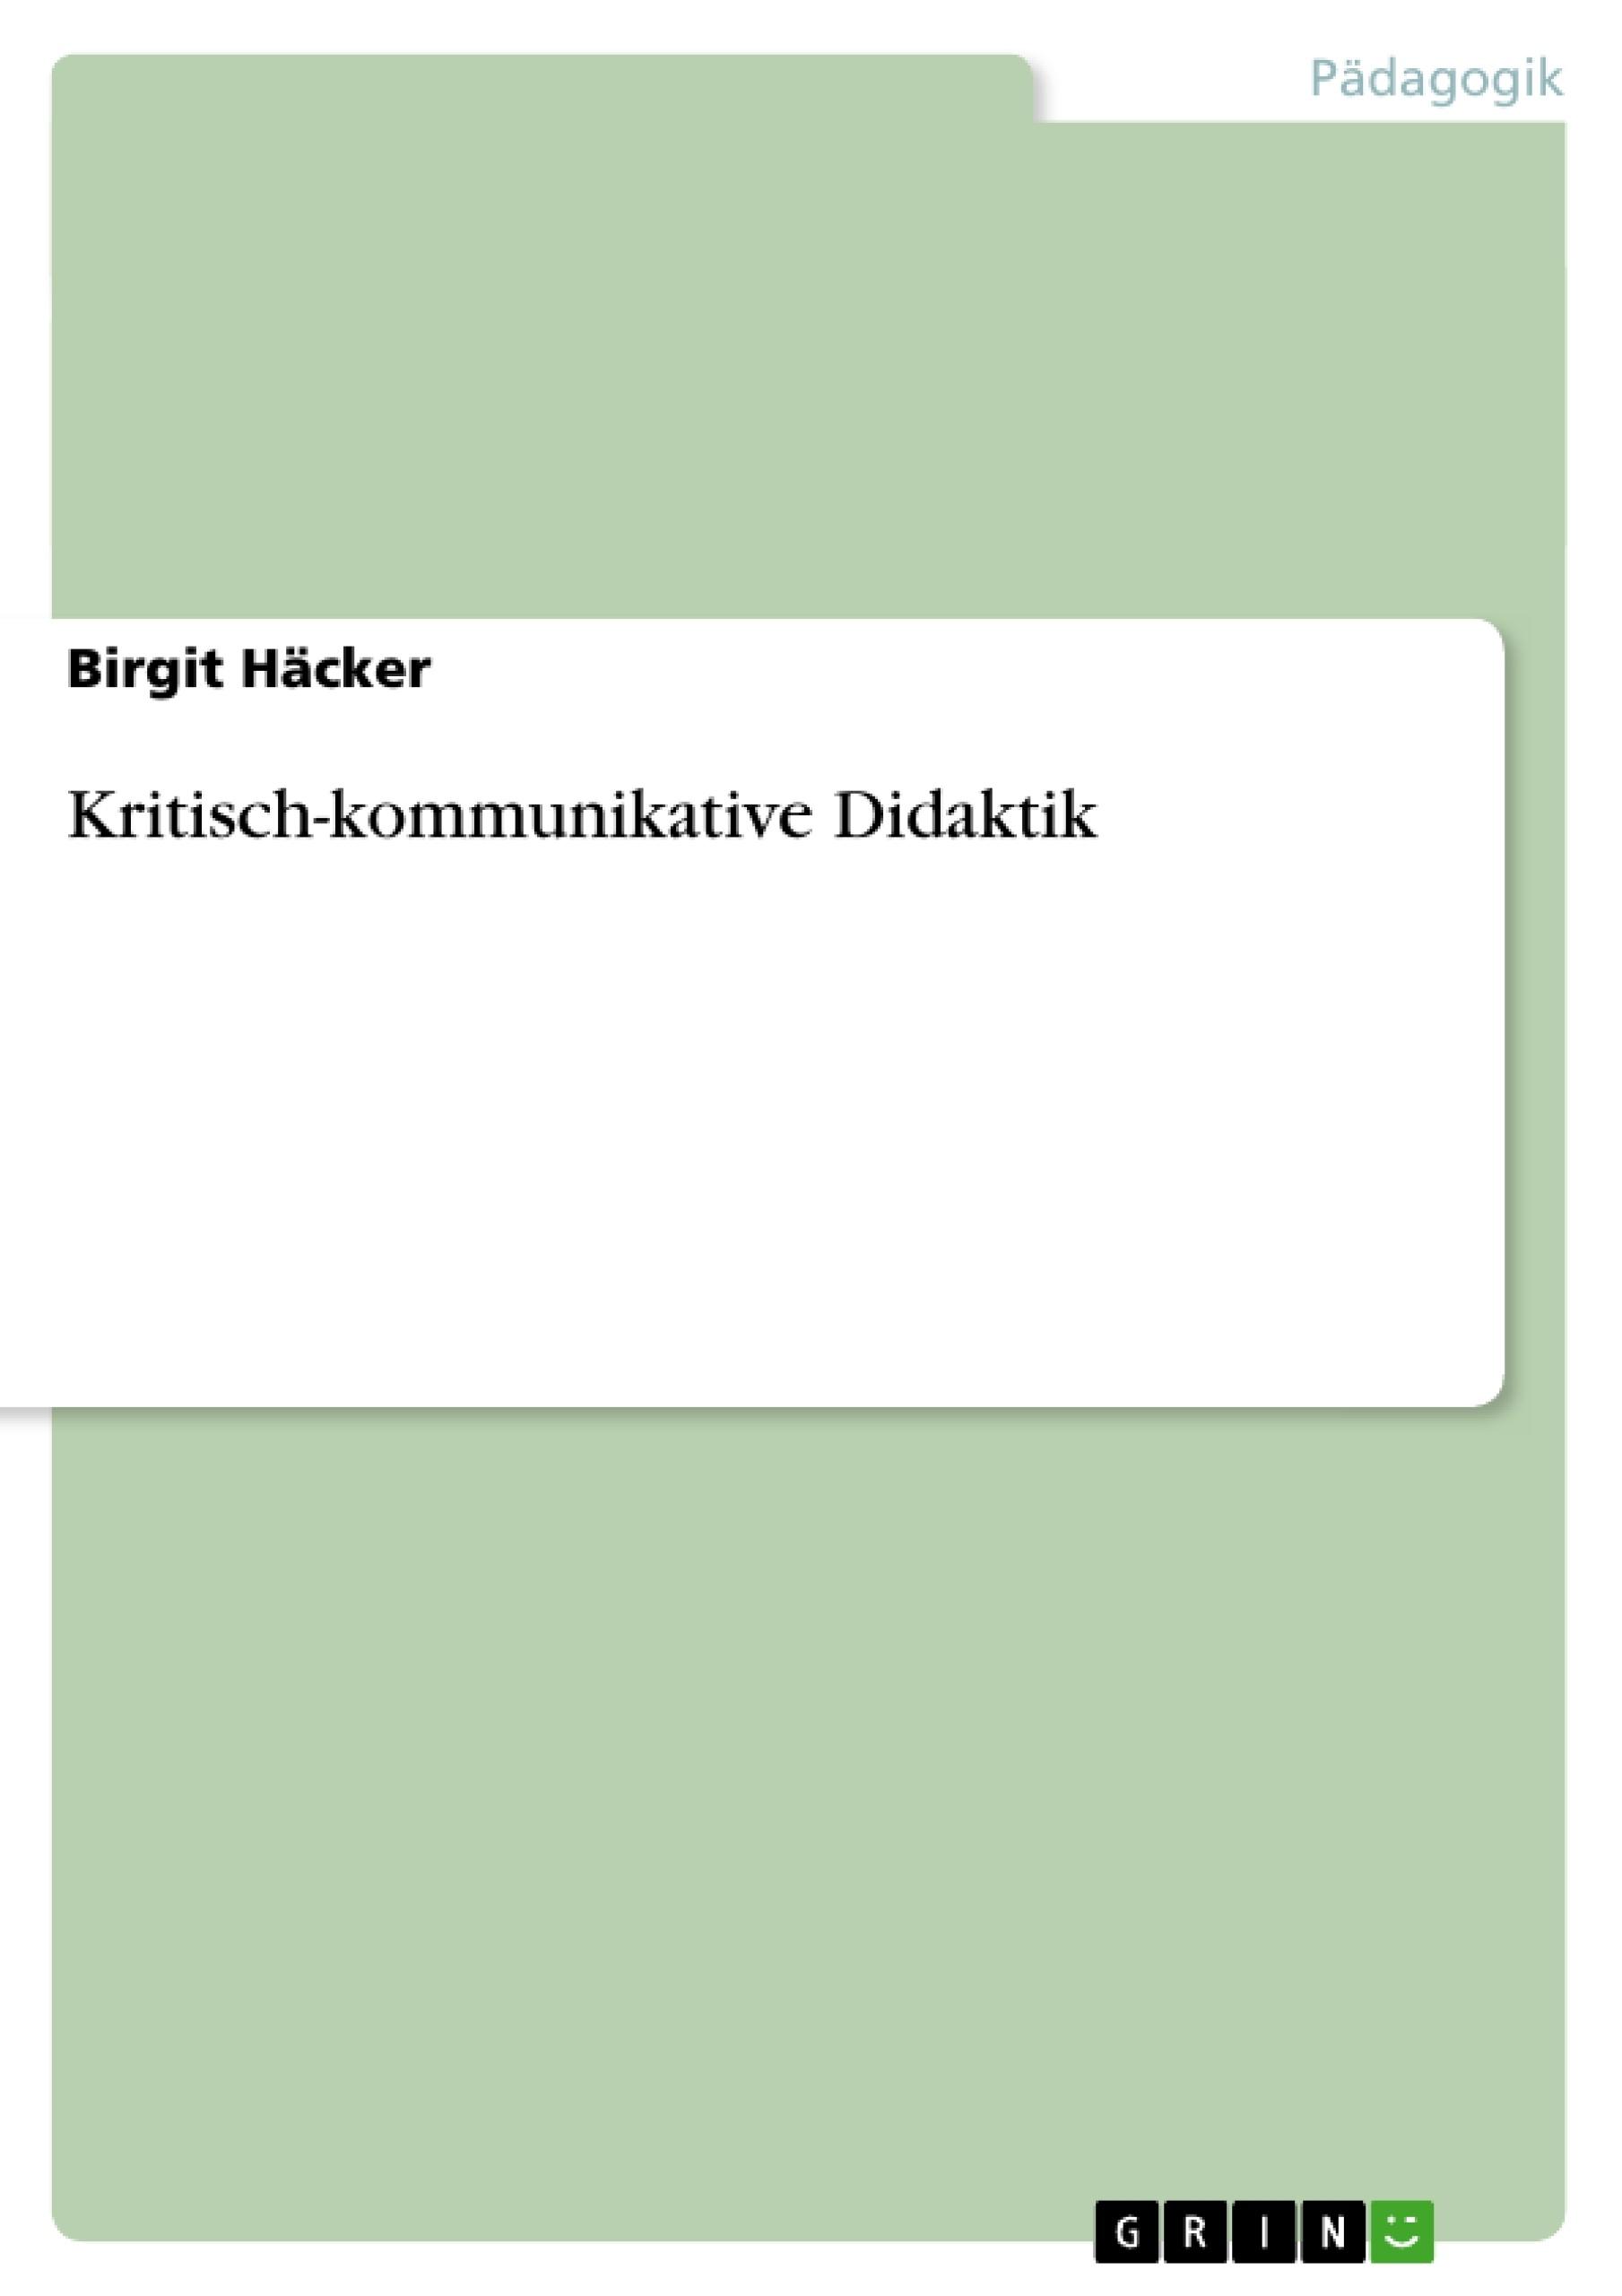 Titel: Kritisch-kommunikative Didaktik